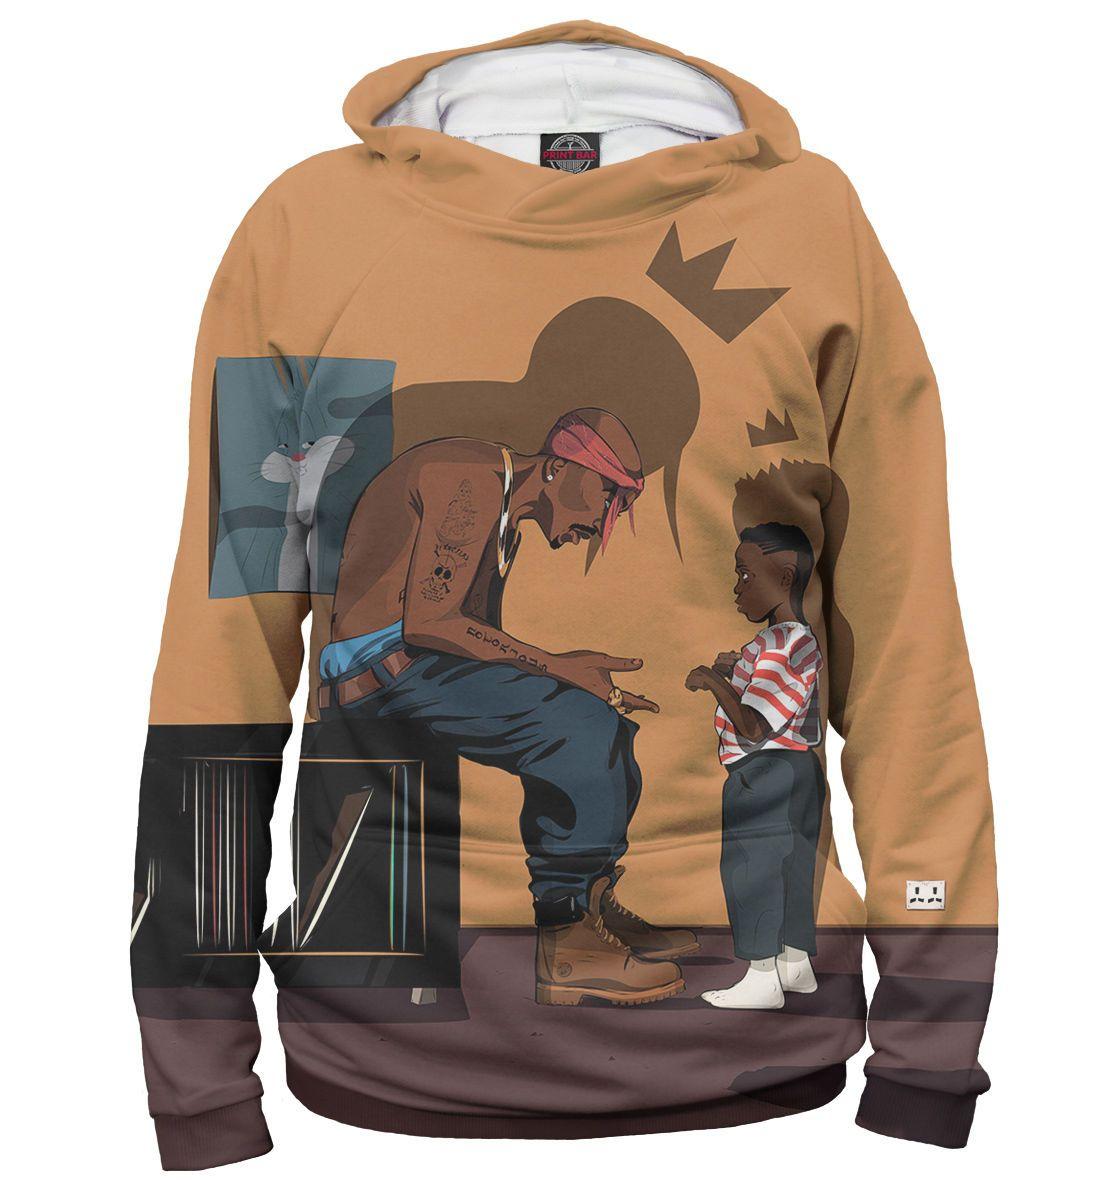 2Pac Exclusive Cool Man Hoodie Shakur Tupac Rap Hip Hop Music 6 Full Print  Pb b483221b5f5